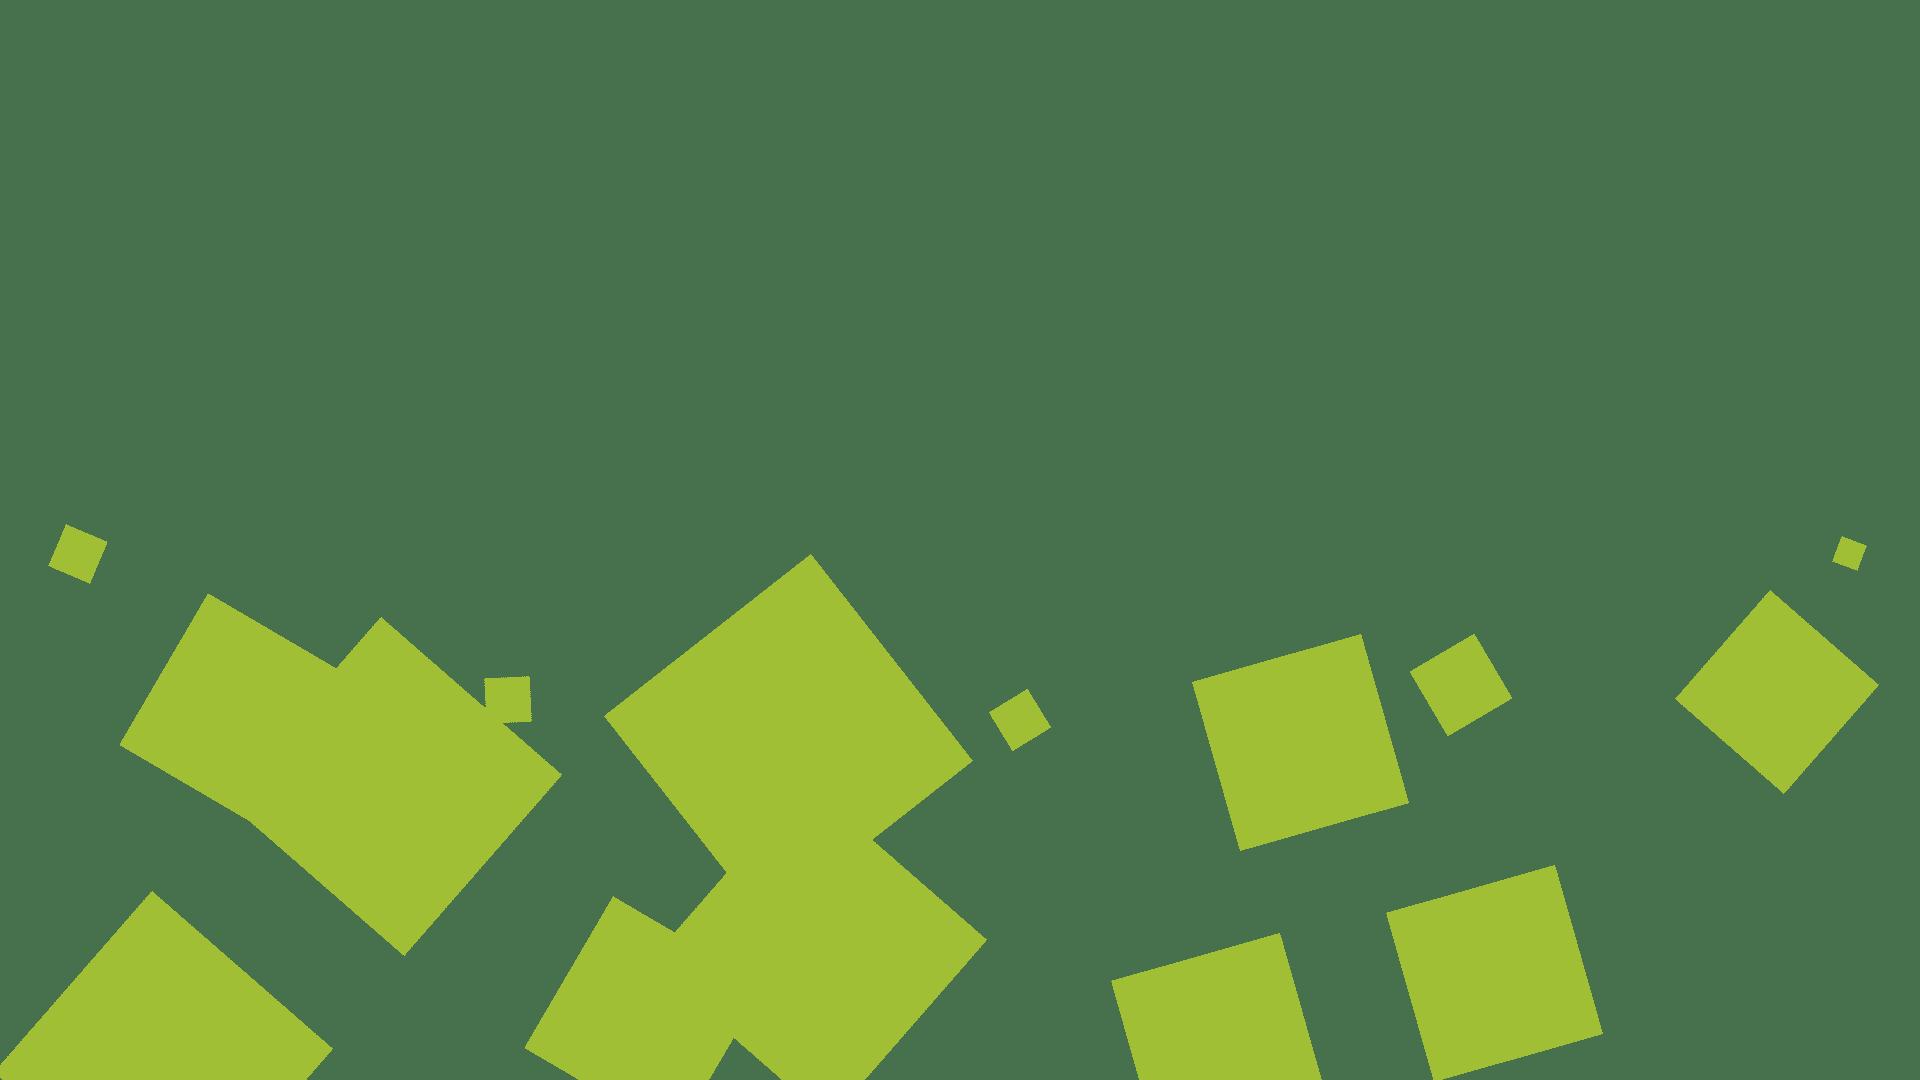 green-row-3